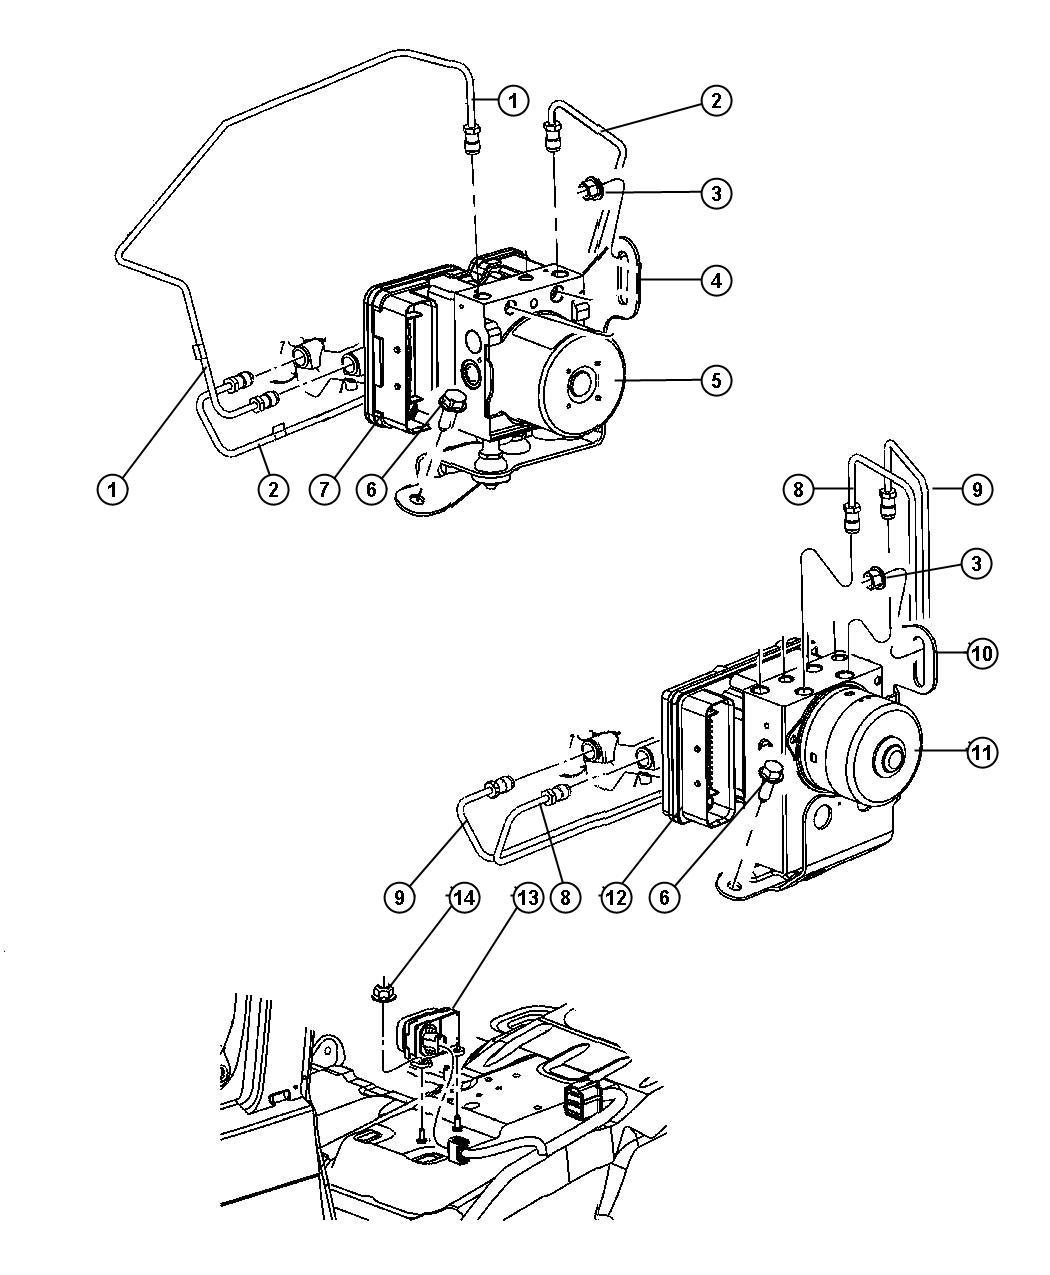 Jeep Grand Cherokee Module Sensor Cluster Dynamics